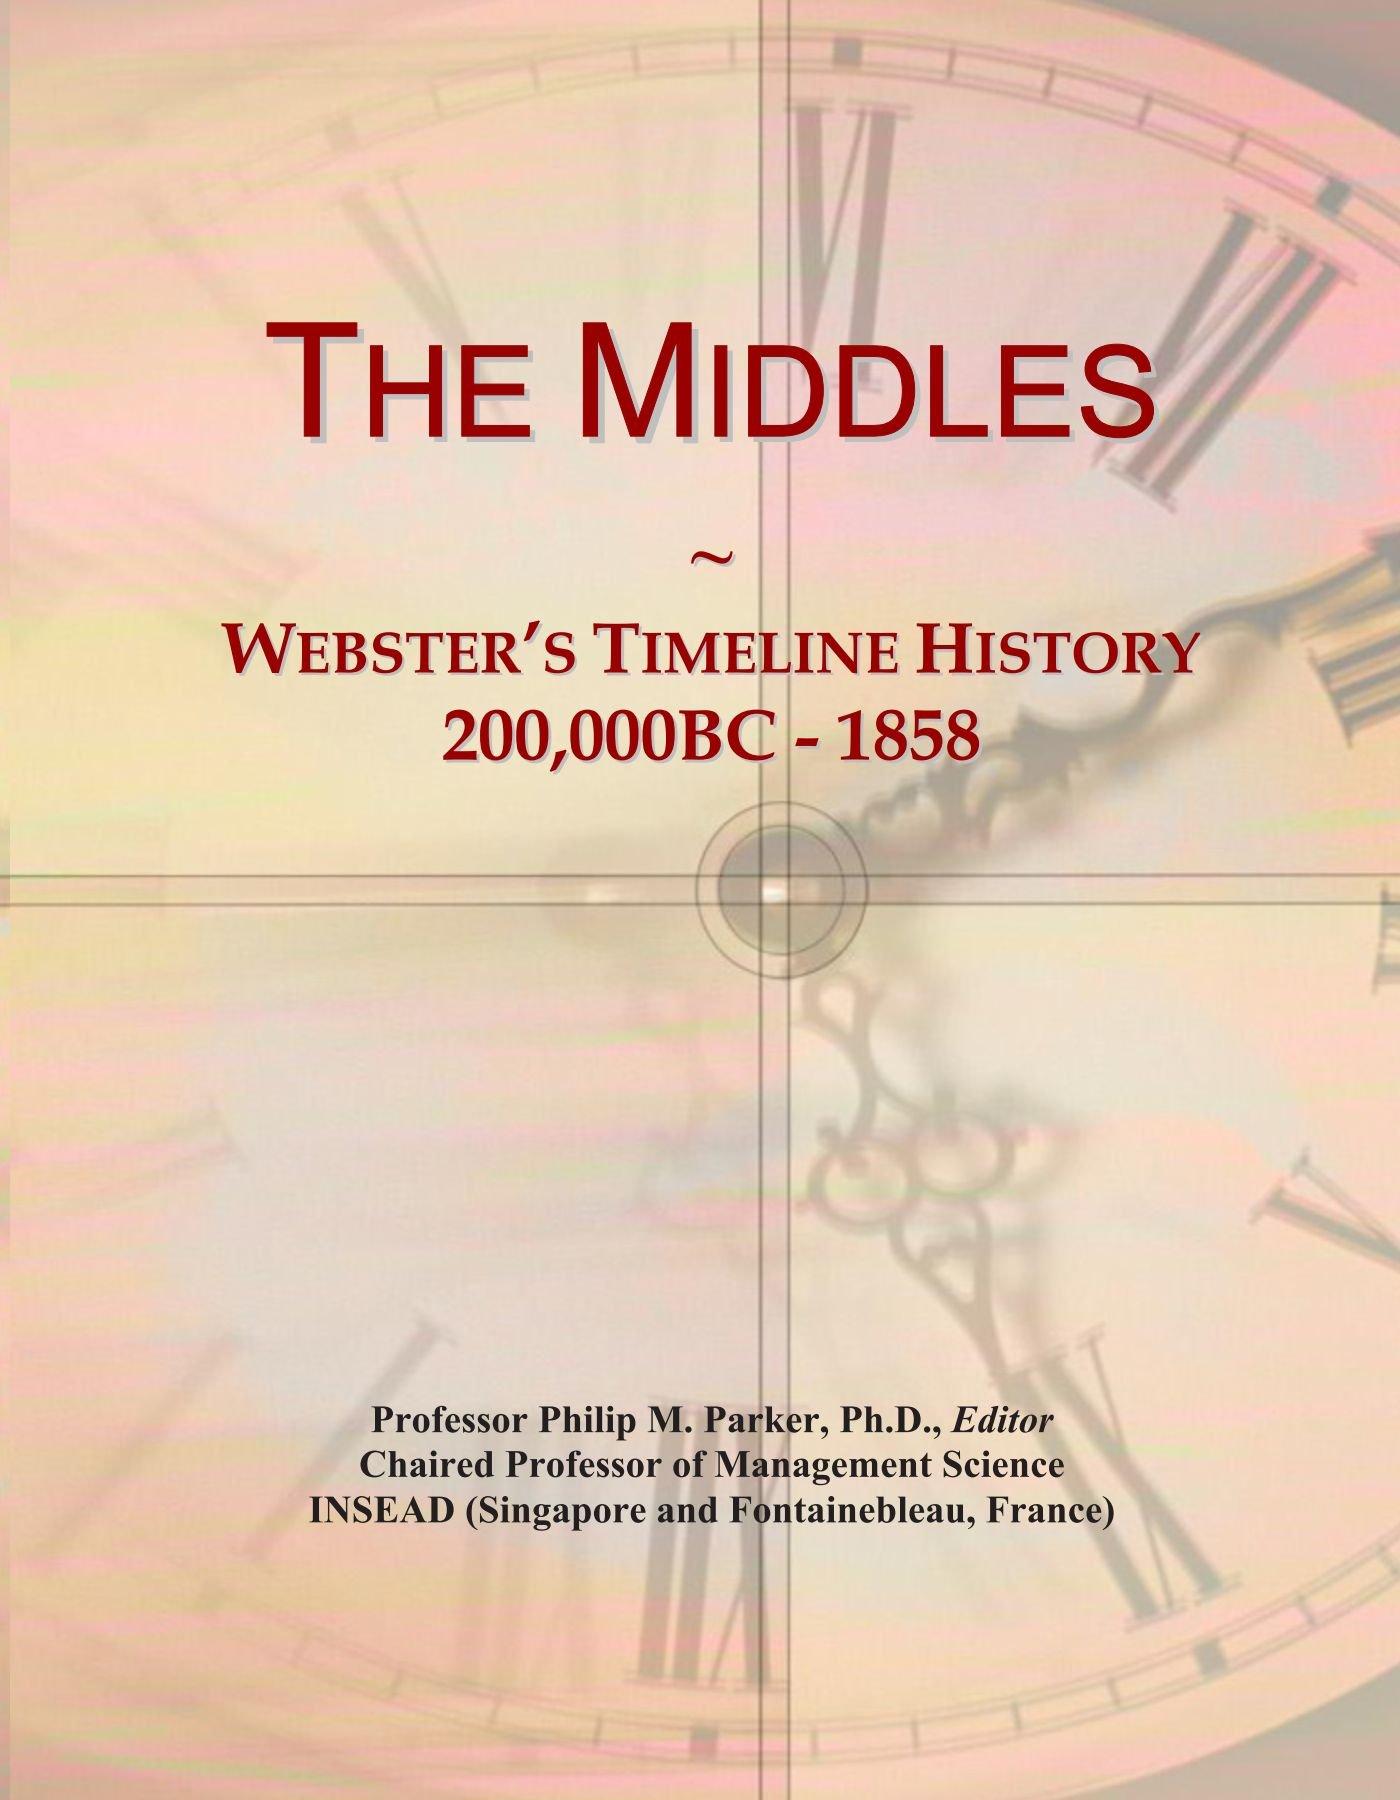 The Middles: Webster's Timeline History, 200,000BC - 1858 ebook